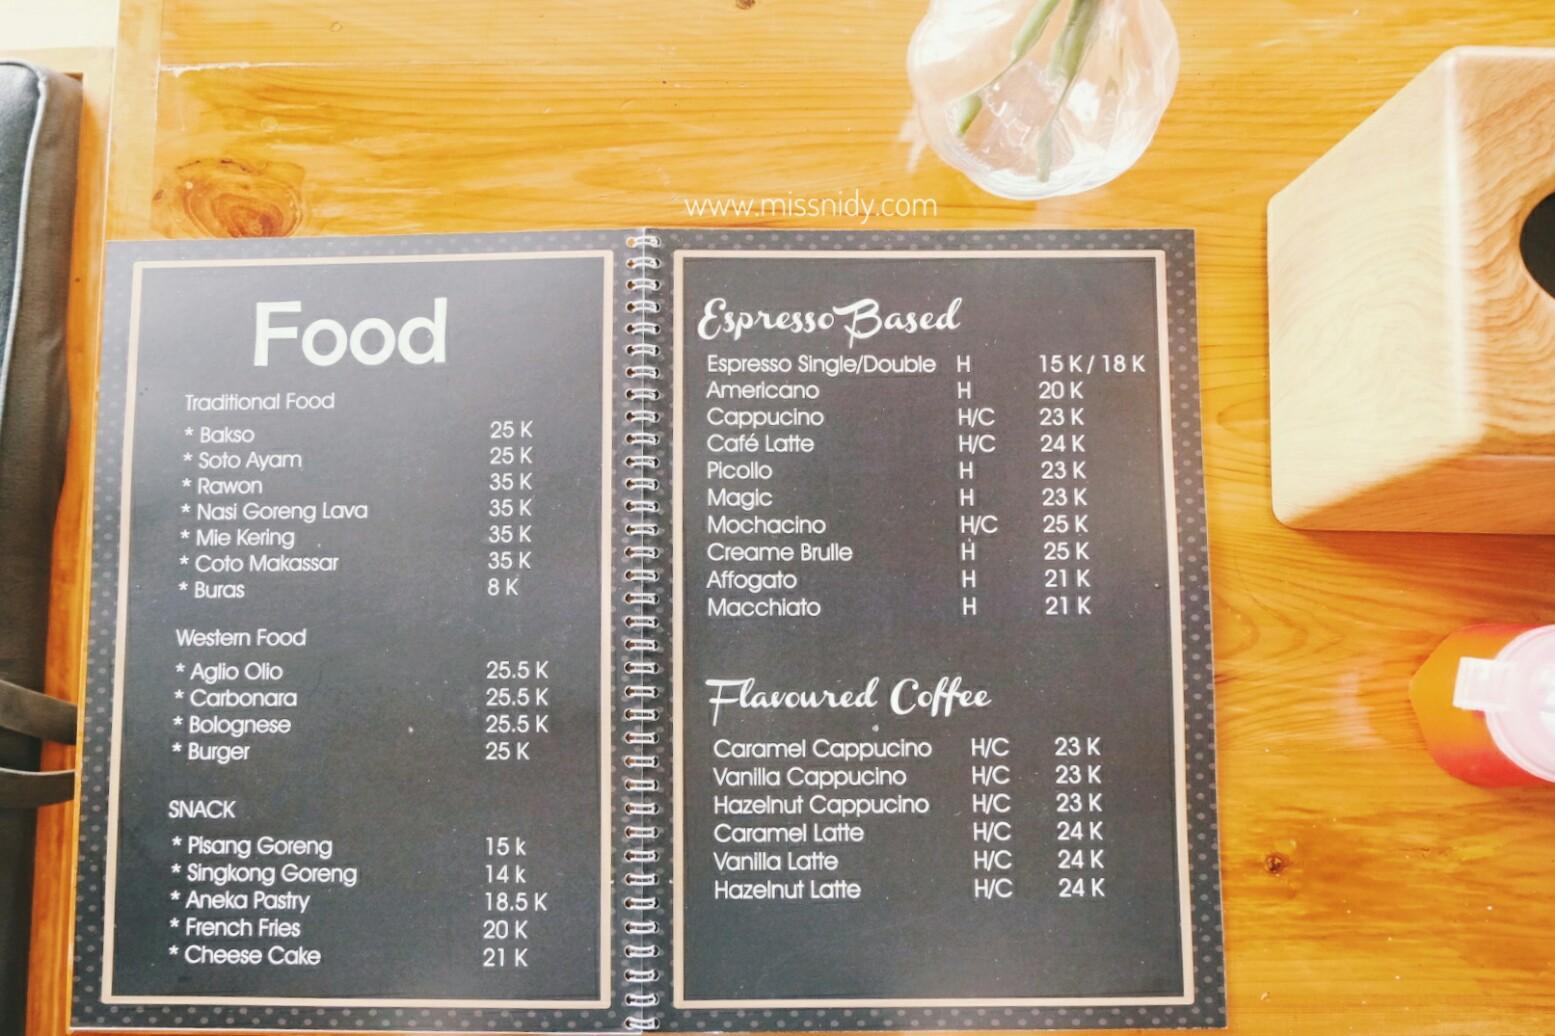 harga kopi di pikot kopi cibubur